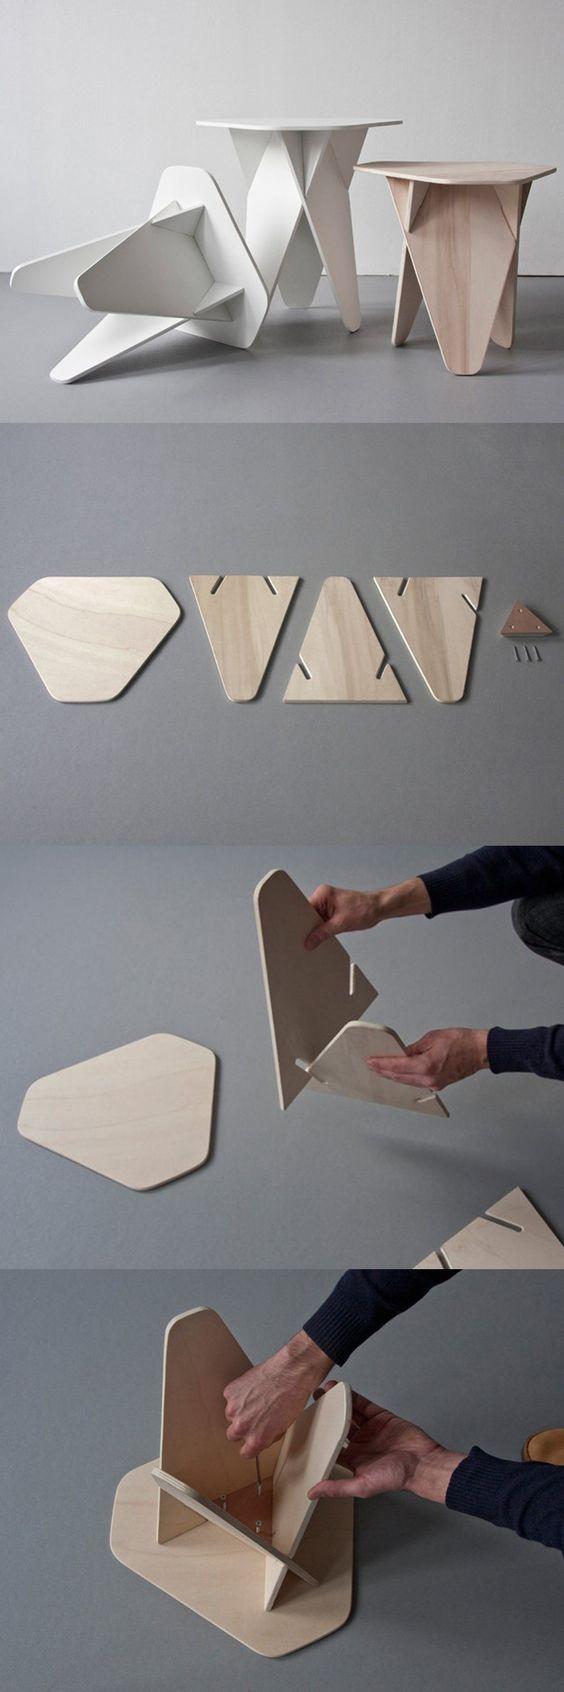 stool: